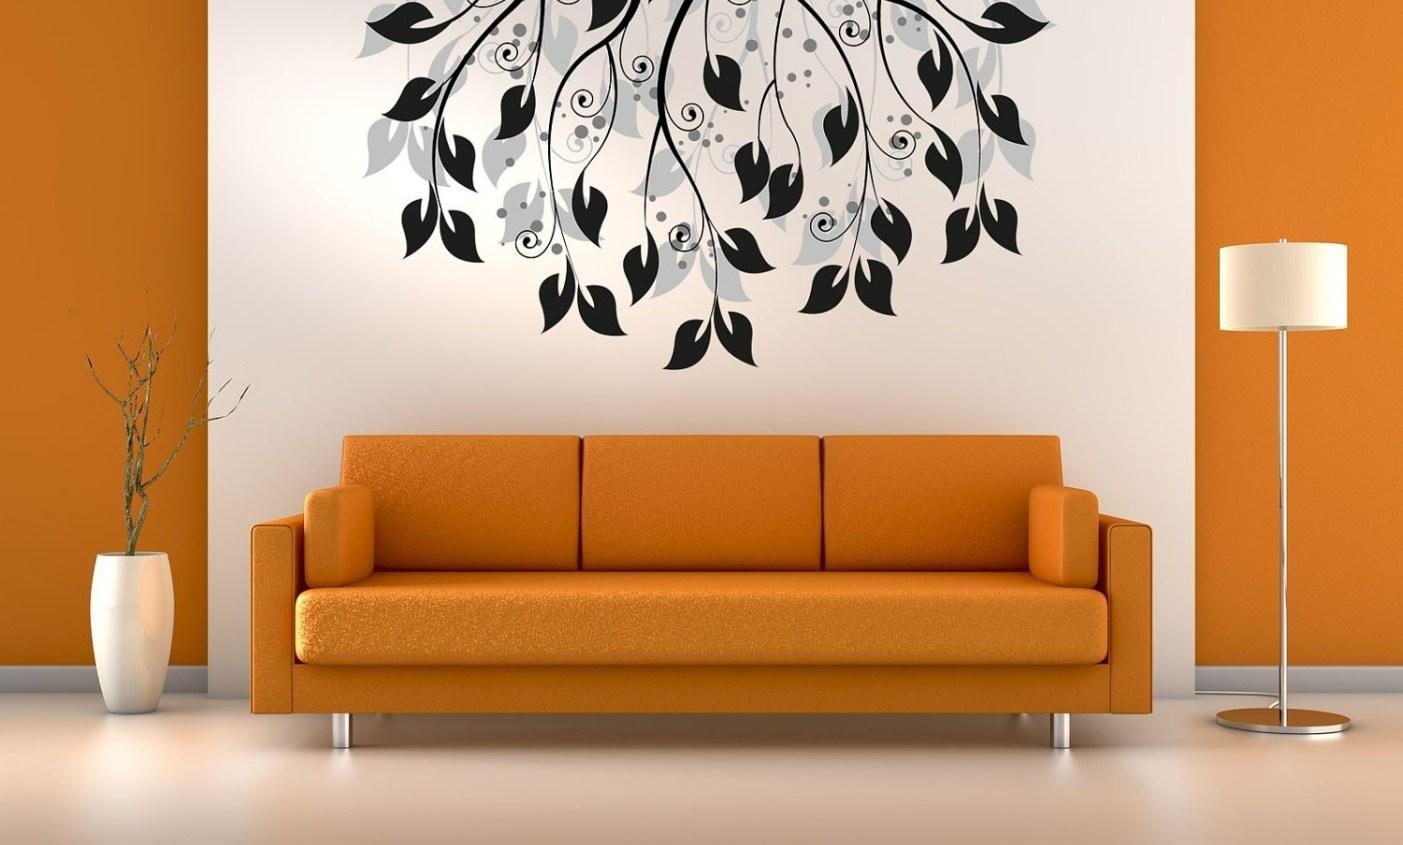 20 photos unusual metal wall art wall art ideas. Black Bedroom Furniture Sets. Home Design Ideas